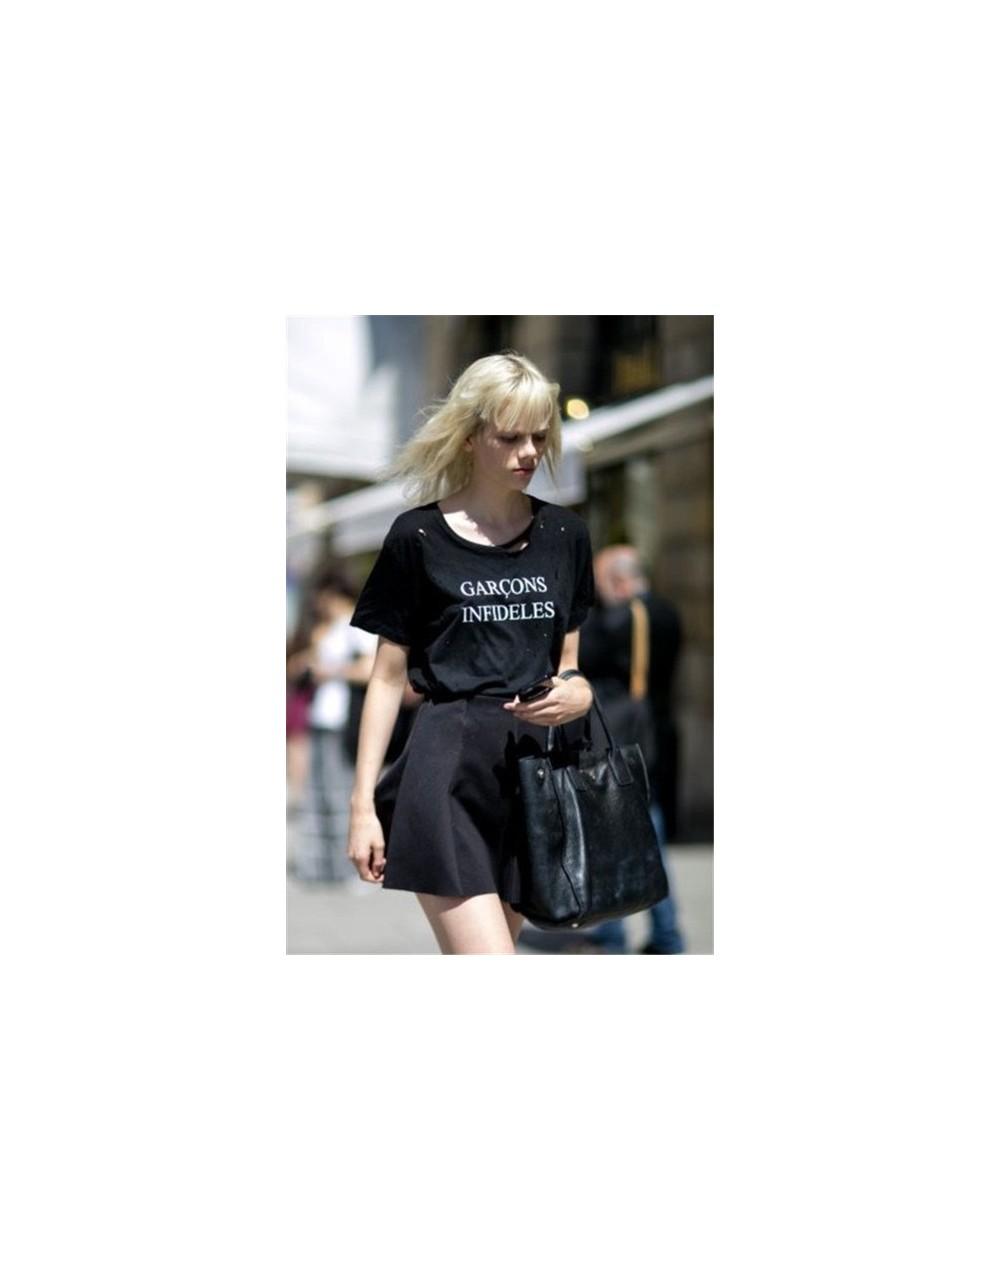 Black Is My Happy Color Letter Women Unisex Black O Neck T Shirts Printing Fashion Tee Black Tops - WTQH769-black - 4I350039...